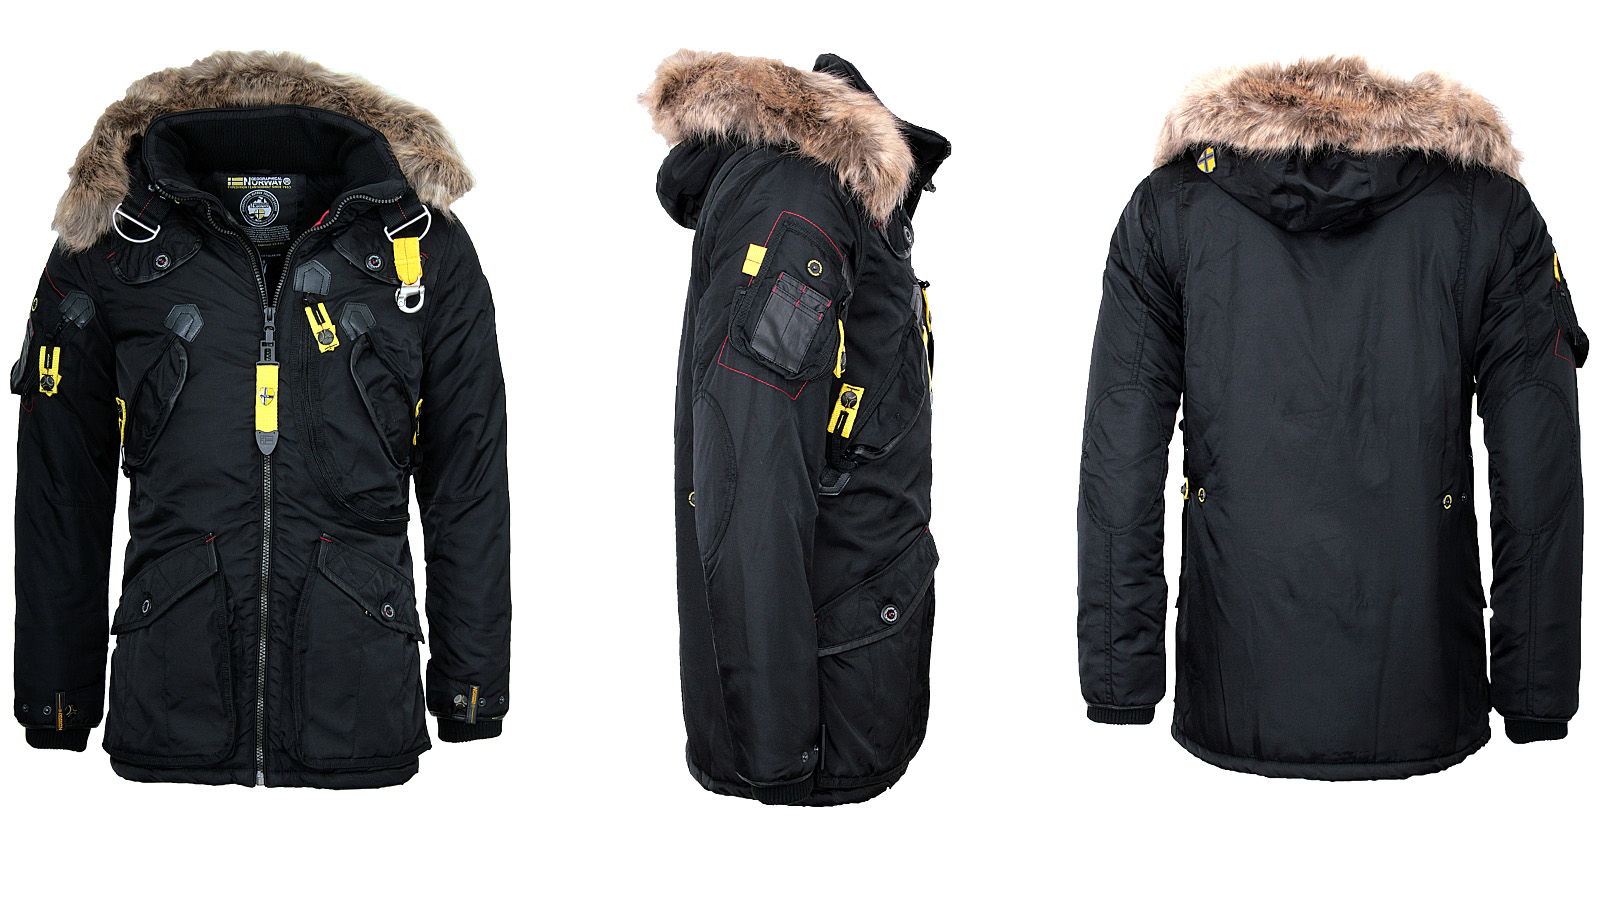 geographical norway warm mens winter jacket parka anorak. Black Bedroom Furniture Sets. Home Design Ideas